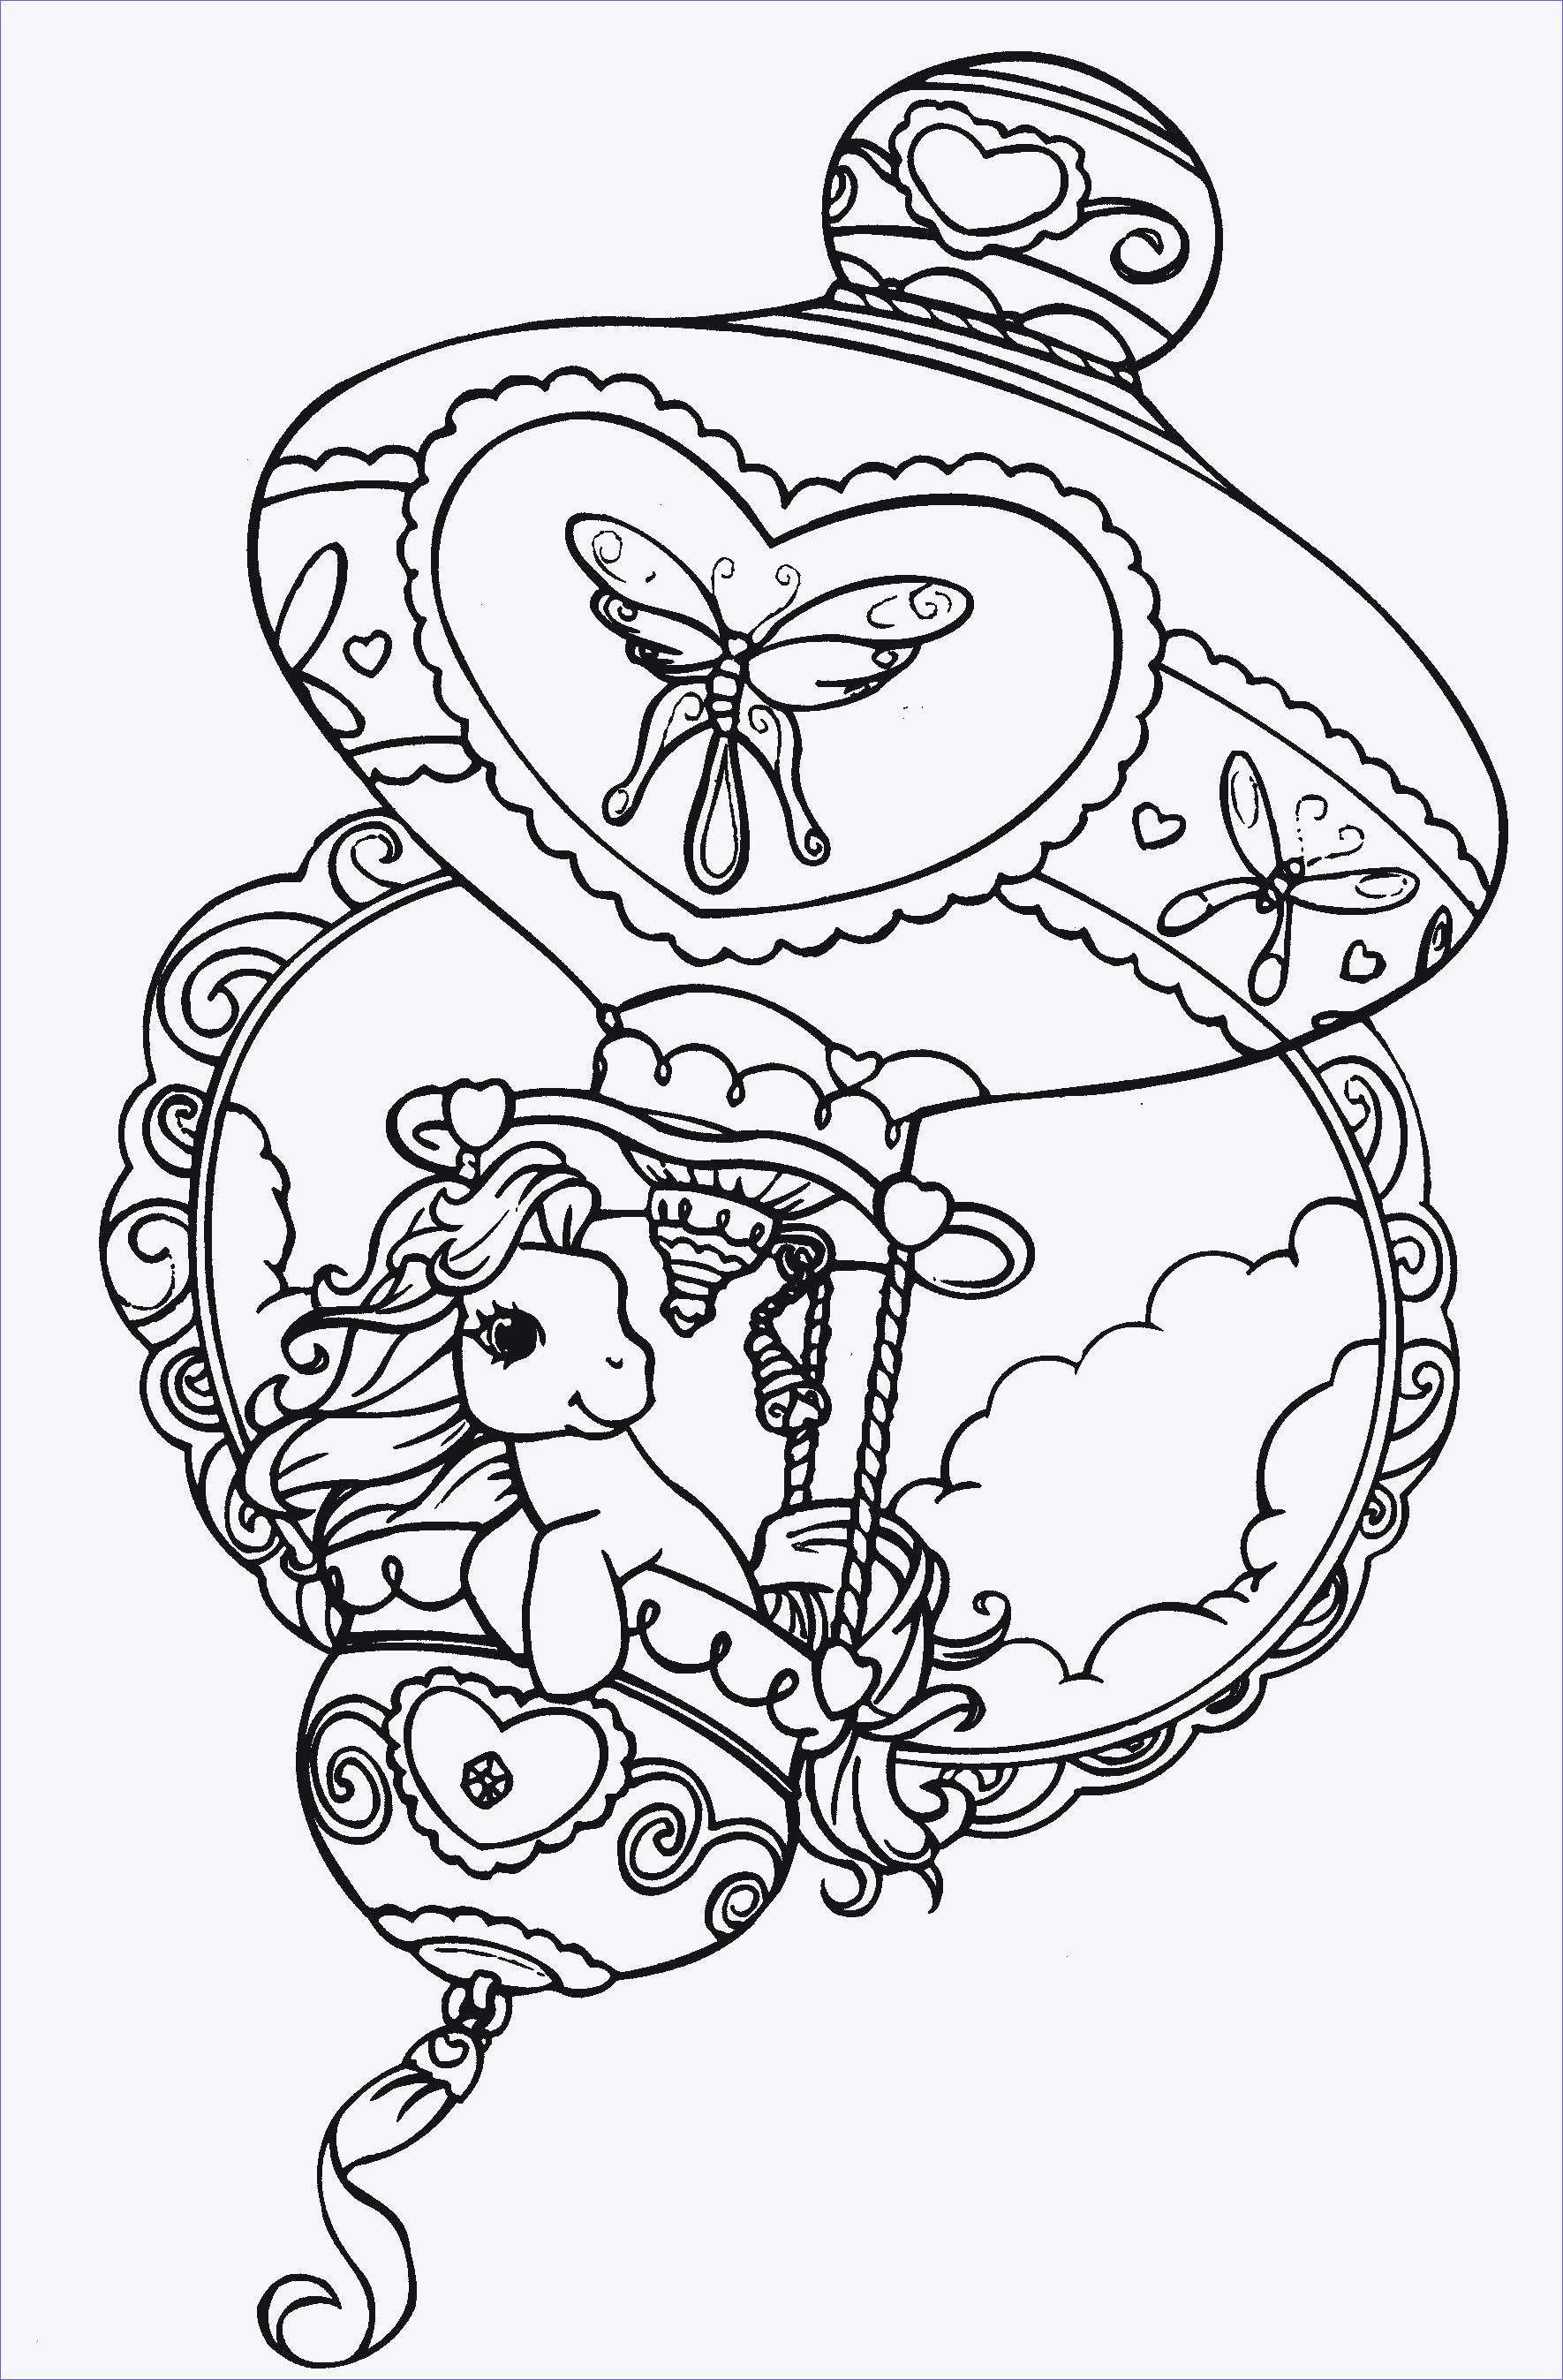 Ausmalbilder My Little Pony Equestria Girl Frisch My Little Pony Ausmalbilder Inspirierend Equestria Girl Ausmalbilder Stock